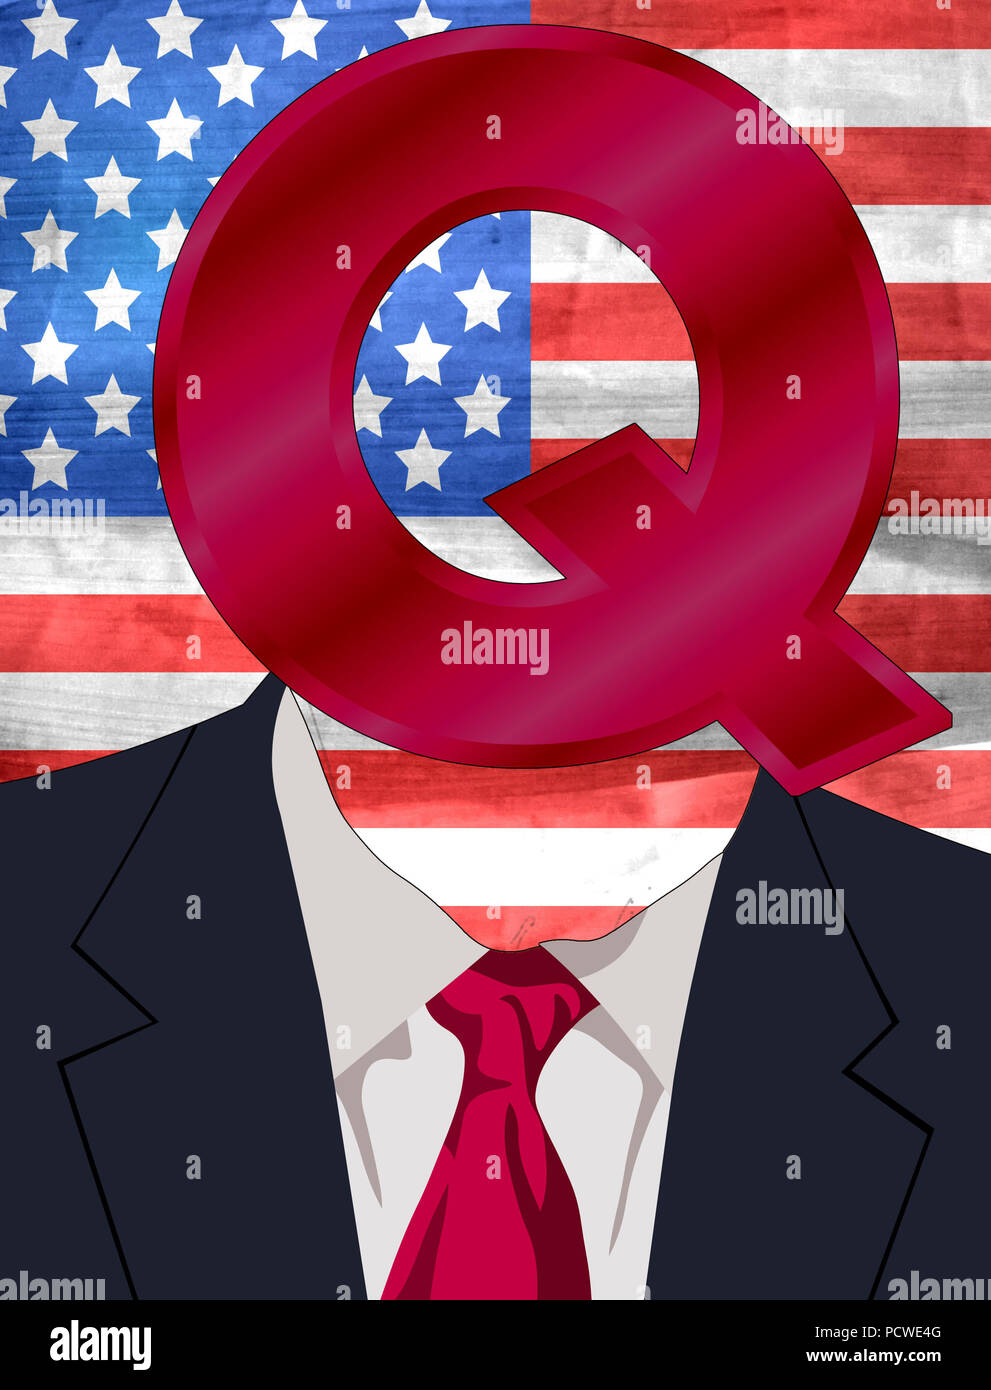 Donald John Trump Q Anon Head - Stock Image